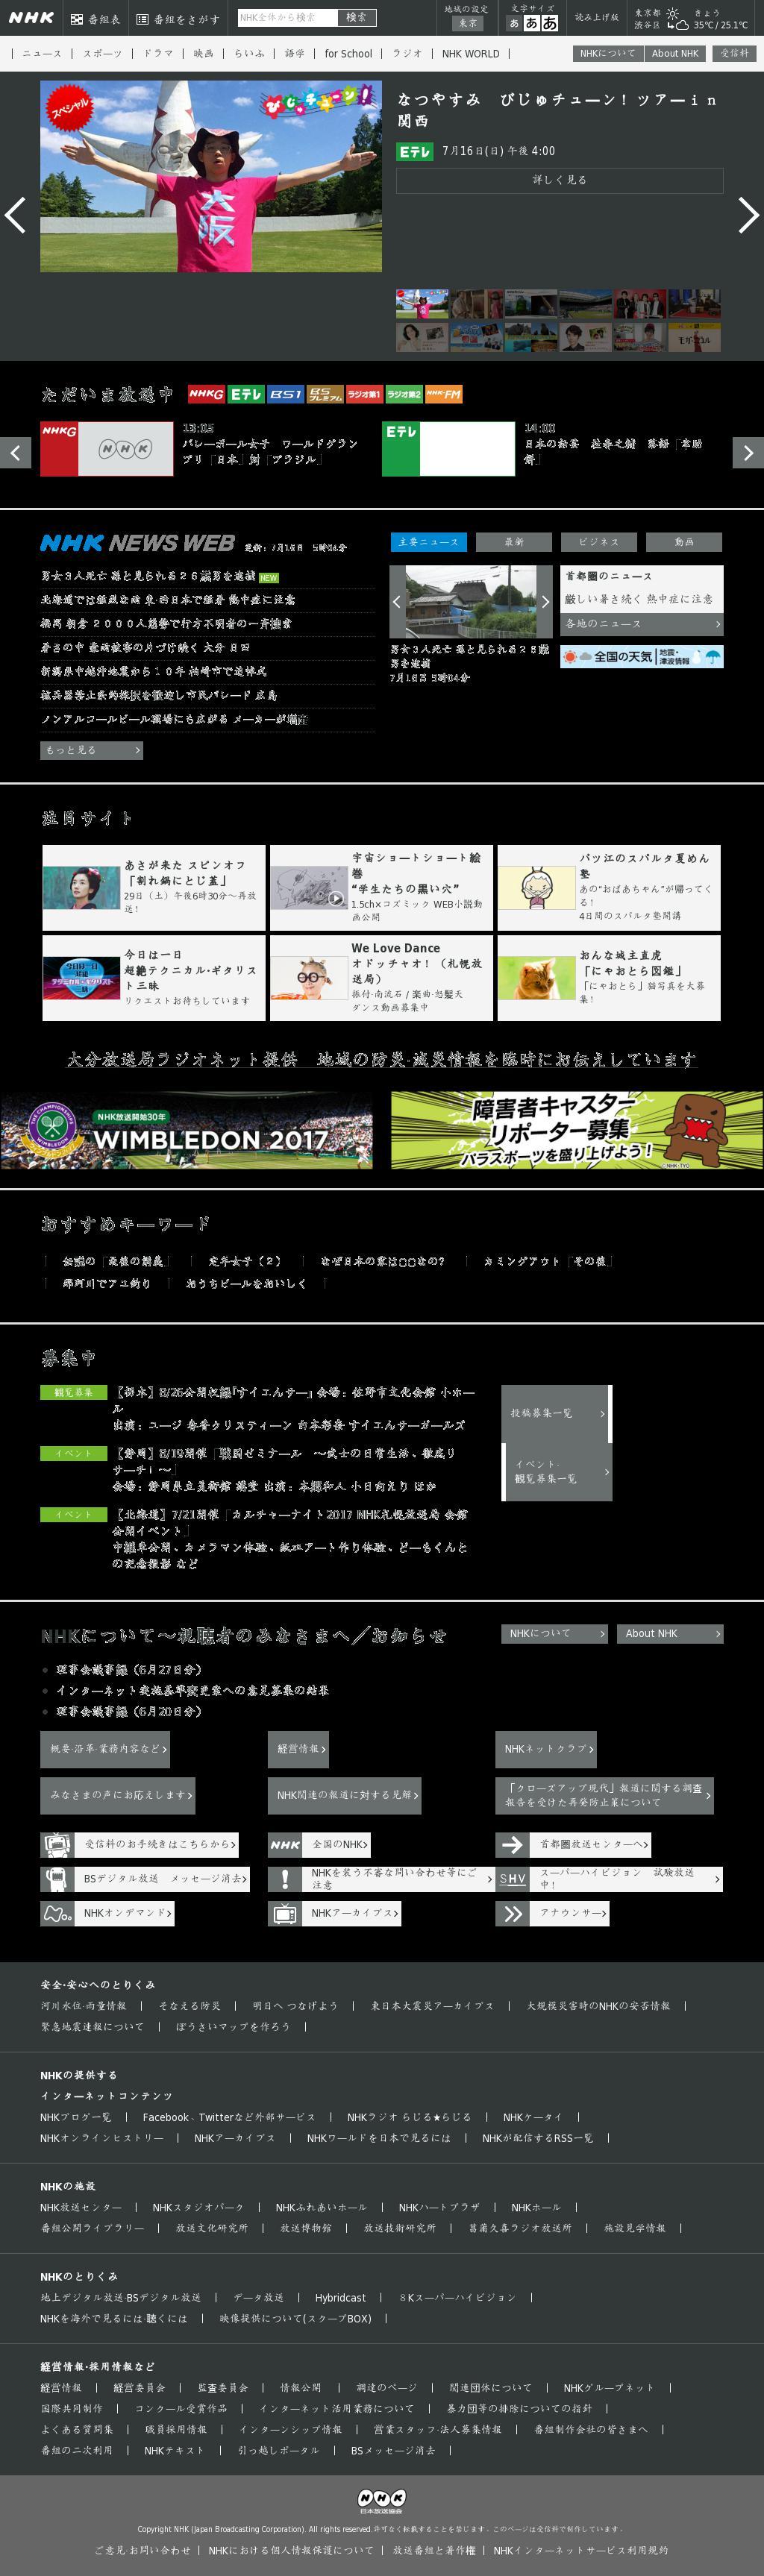 NHK Online at Sunday July 16, 2017, 5:15 a.m. UTC